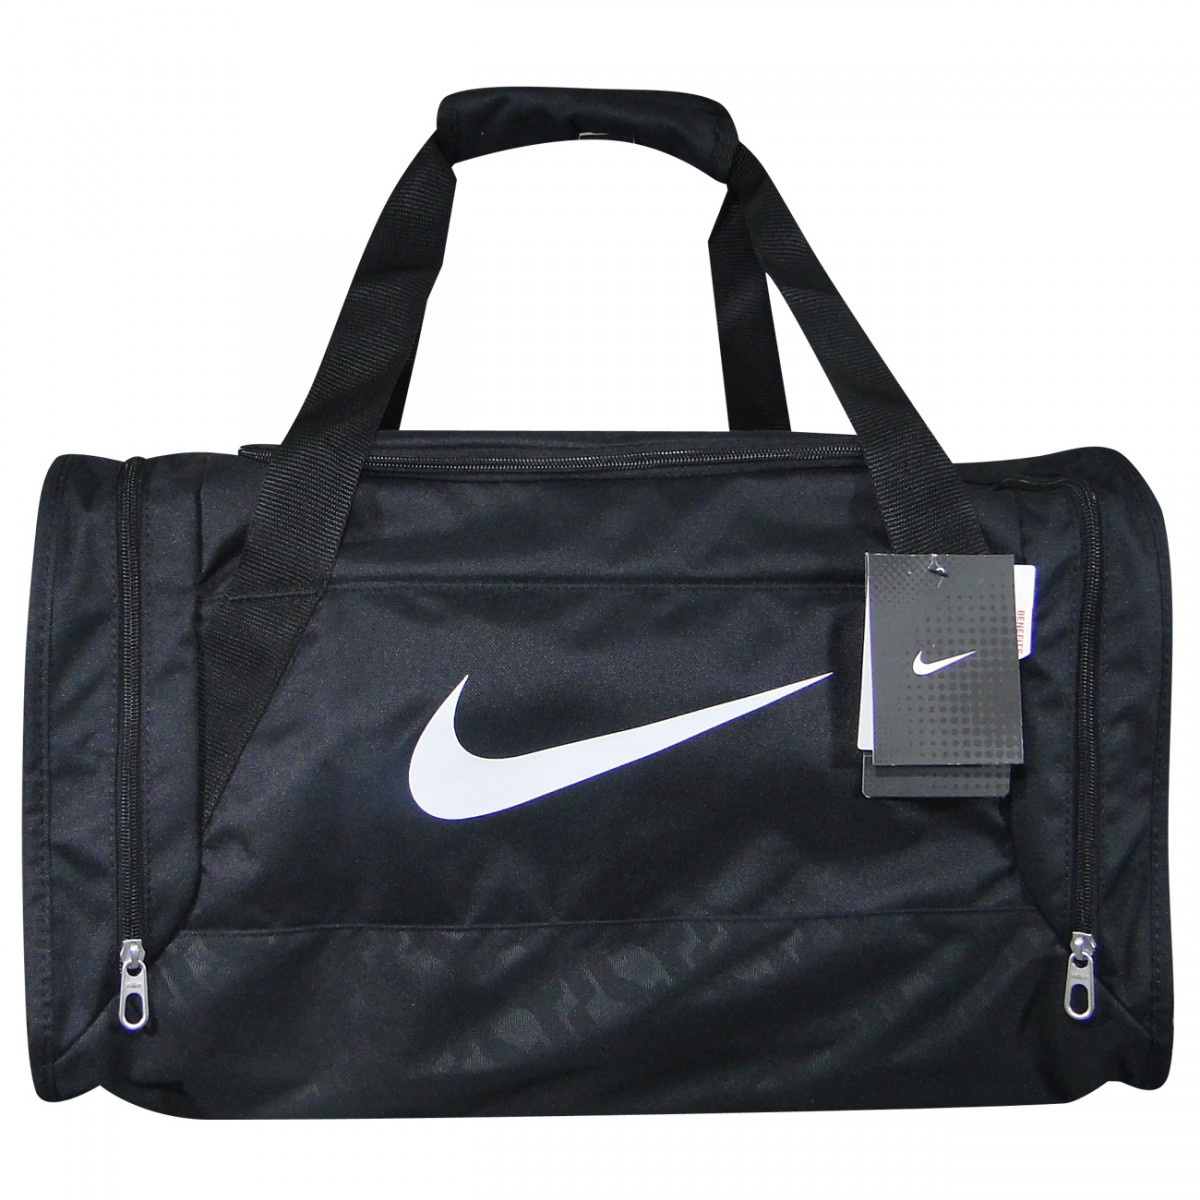 Bolsa Nike BA4831 BA4831 001 - Preto - Chuteira Nike 1b5b1ef221972